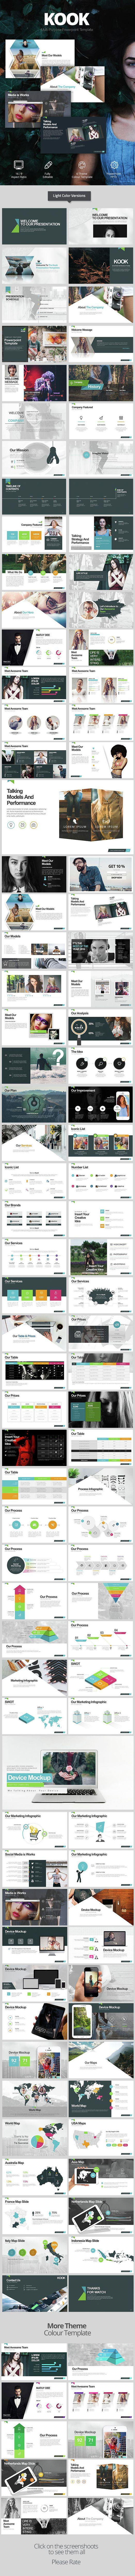 KooK Powerpoint Presentation Template. Download here: http://graphicriver.net/item/kook-powerpoint-presentation/15324176?ref=ksioks